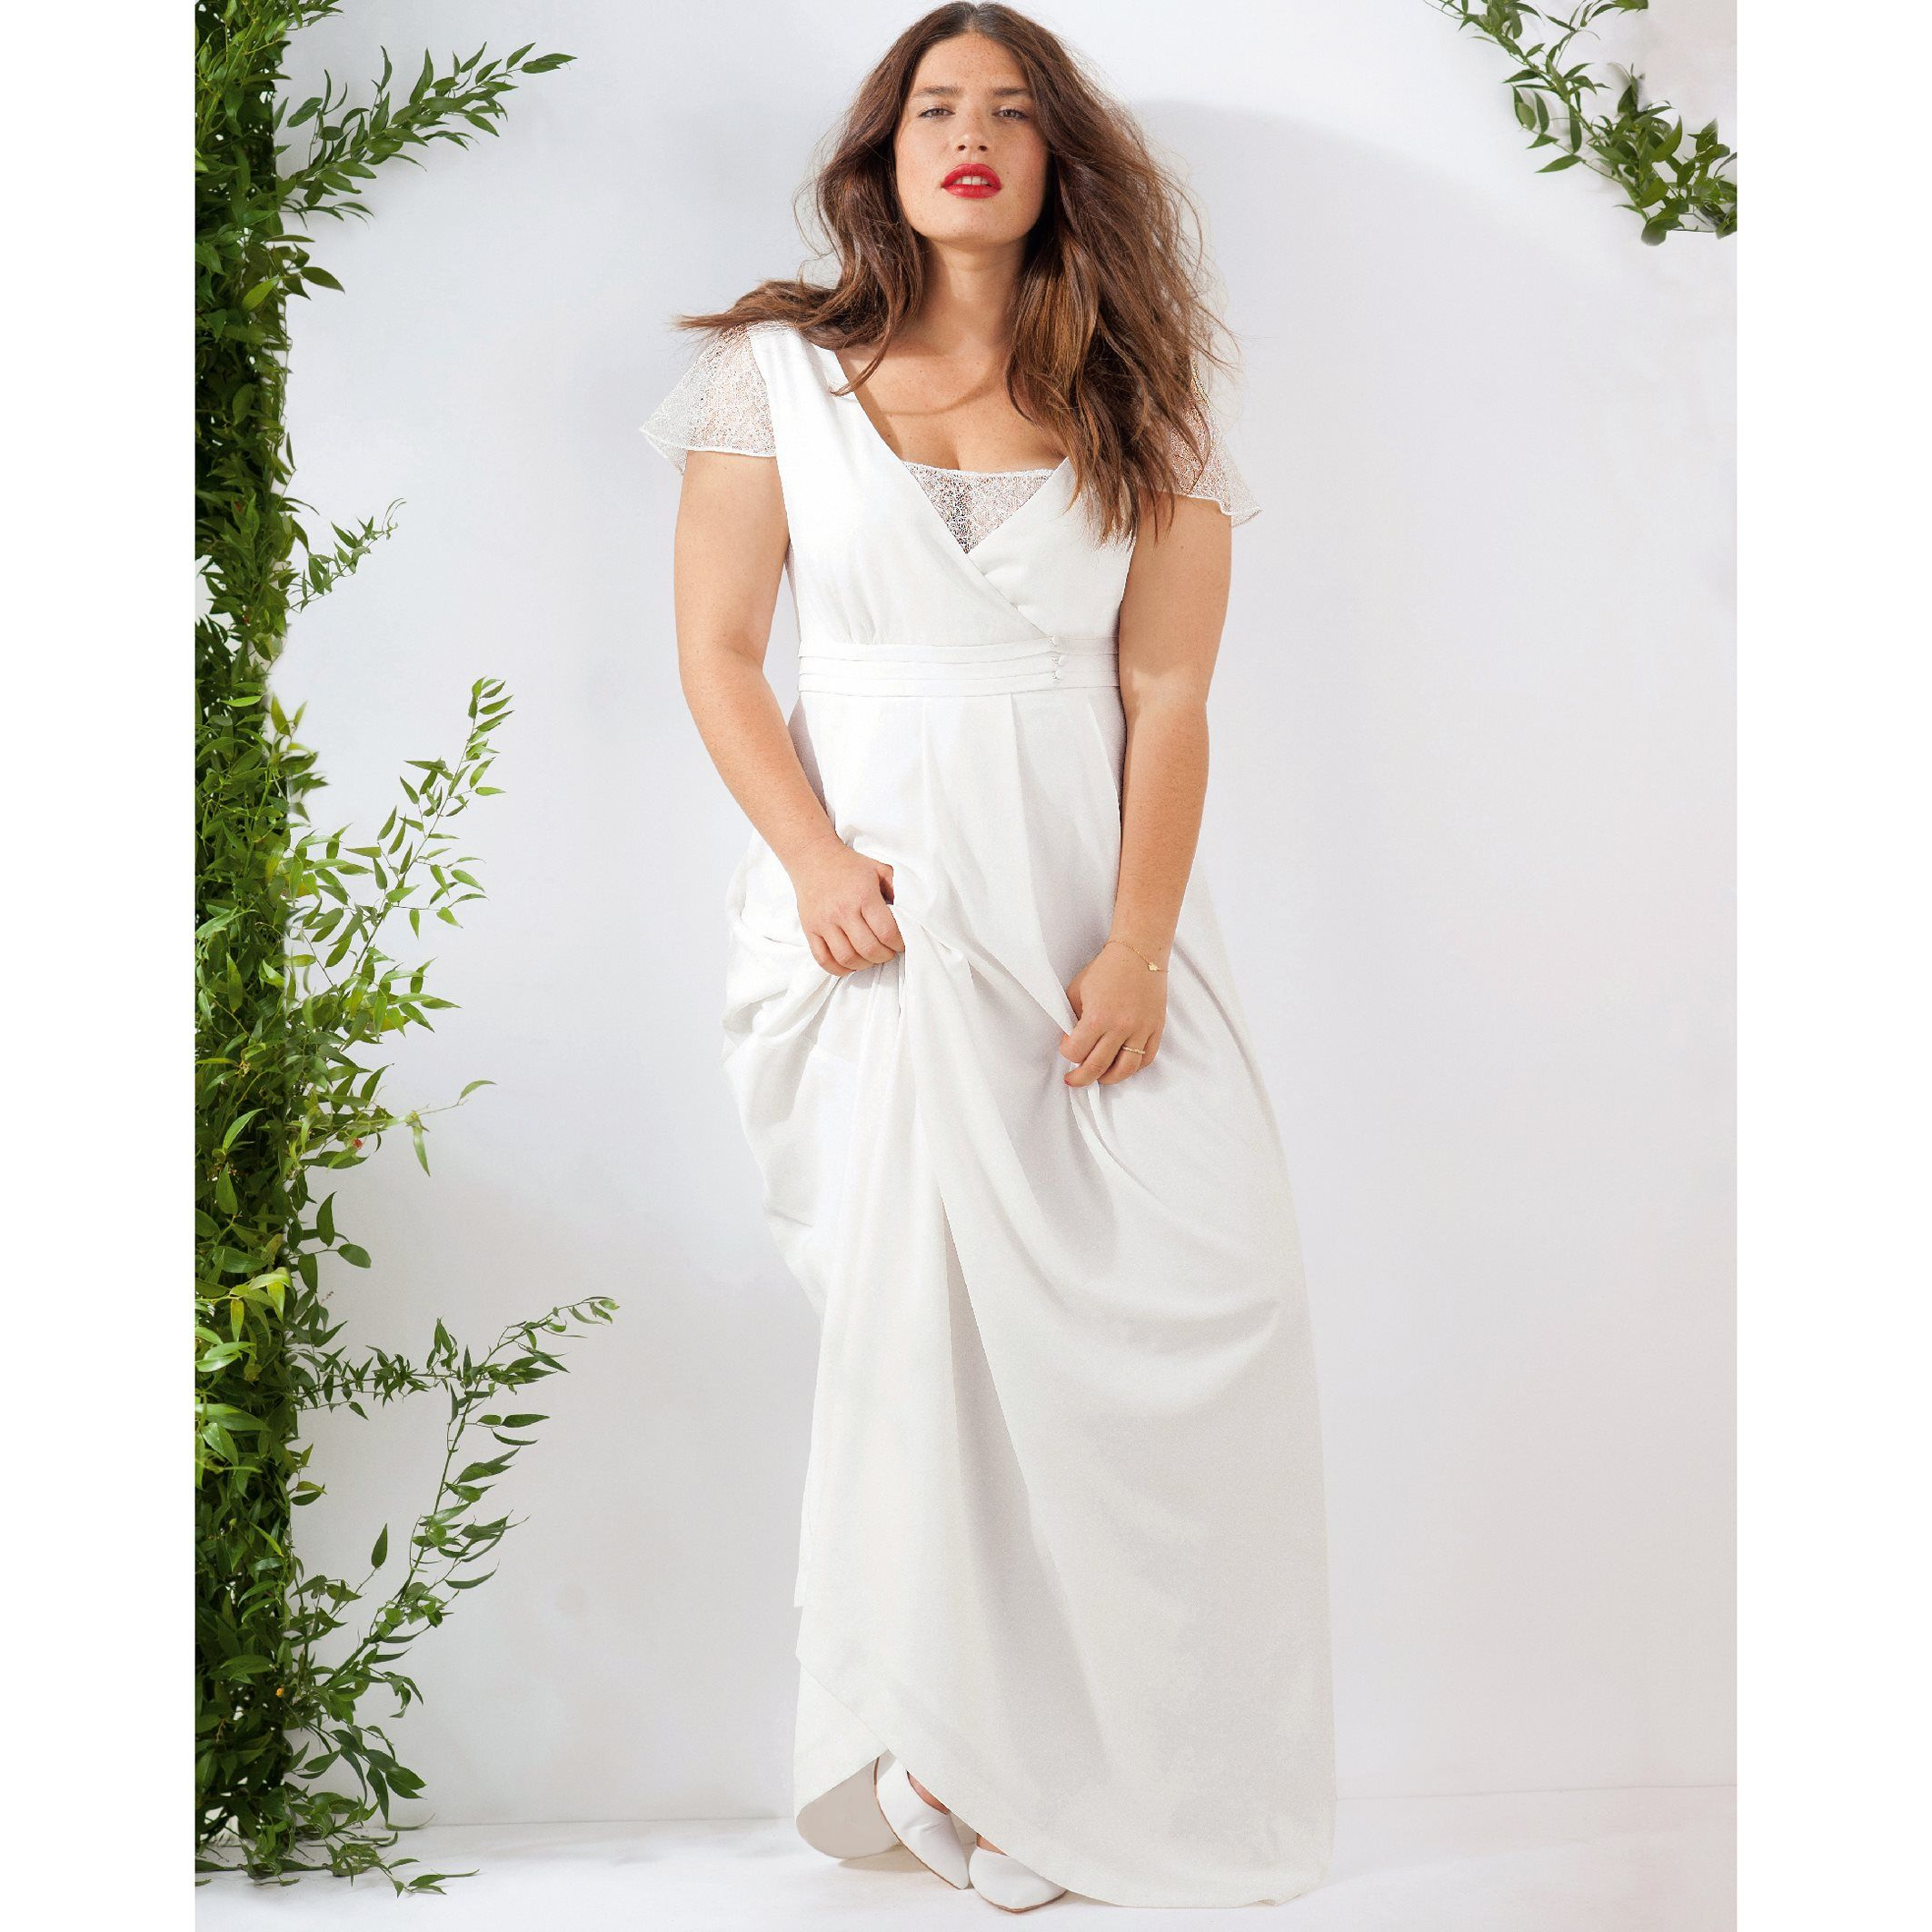 82f9d4f7a1 Vestido largo de boda marfil Castaluna